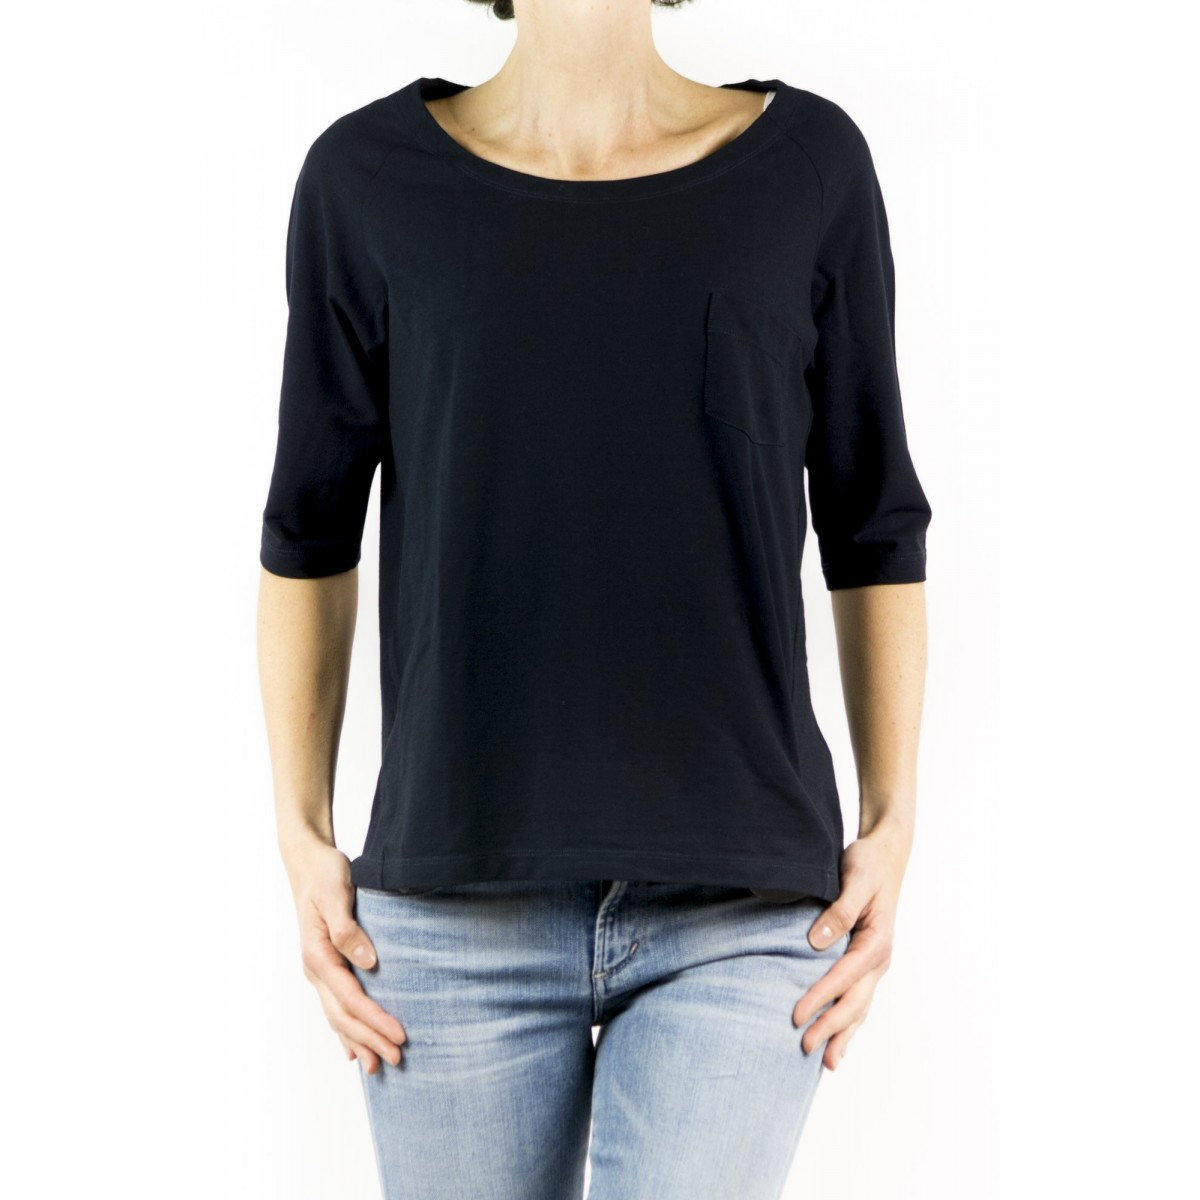 T-Shirt Zanone Woman - 851828 Z0480 T-Shirt Barca Taschino Manica 3/4 Ice Cotton Z0542 - blue navy